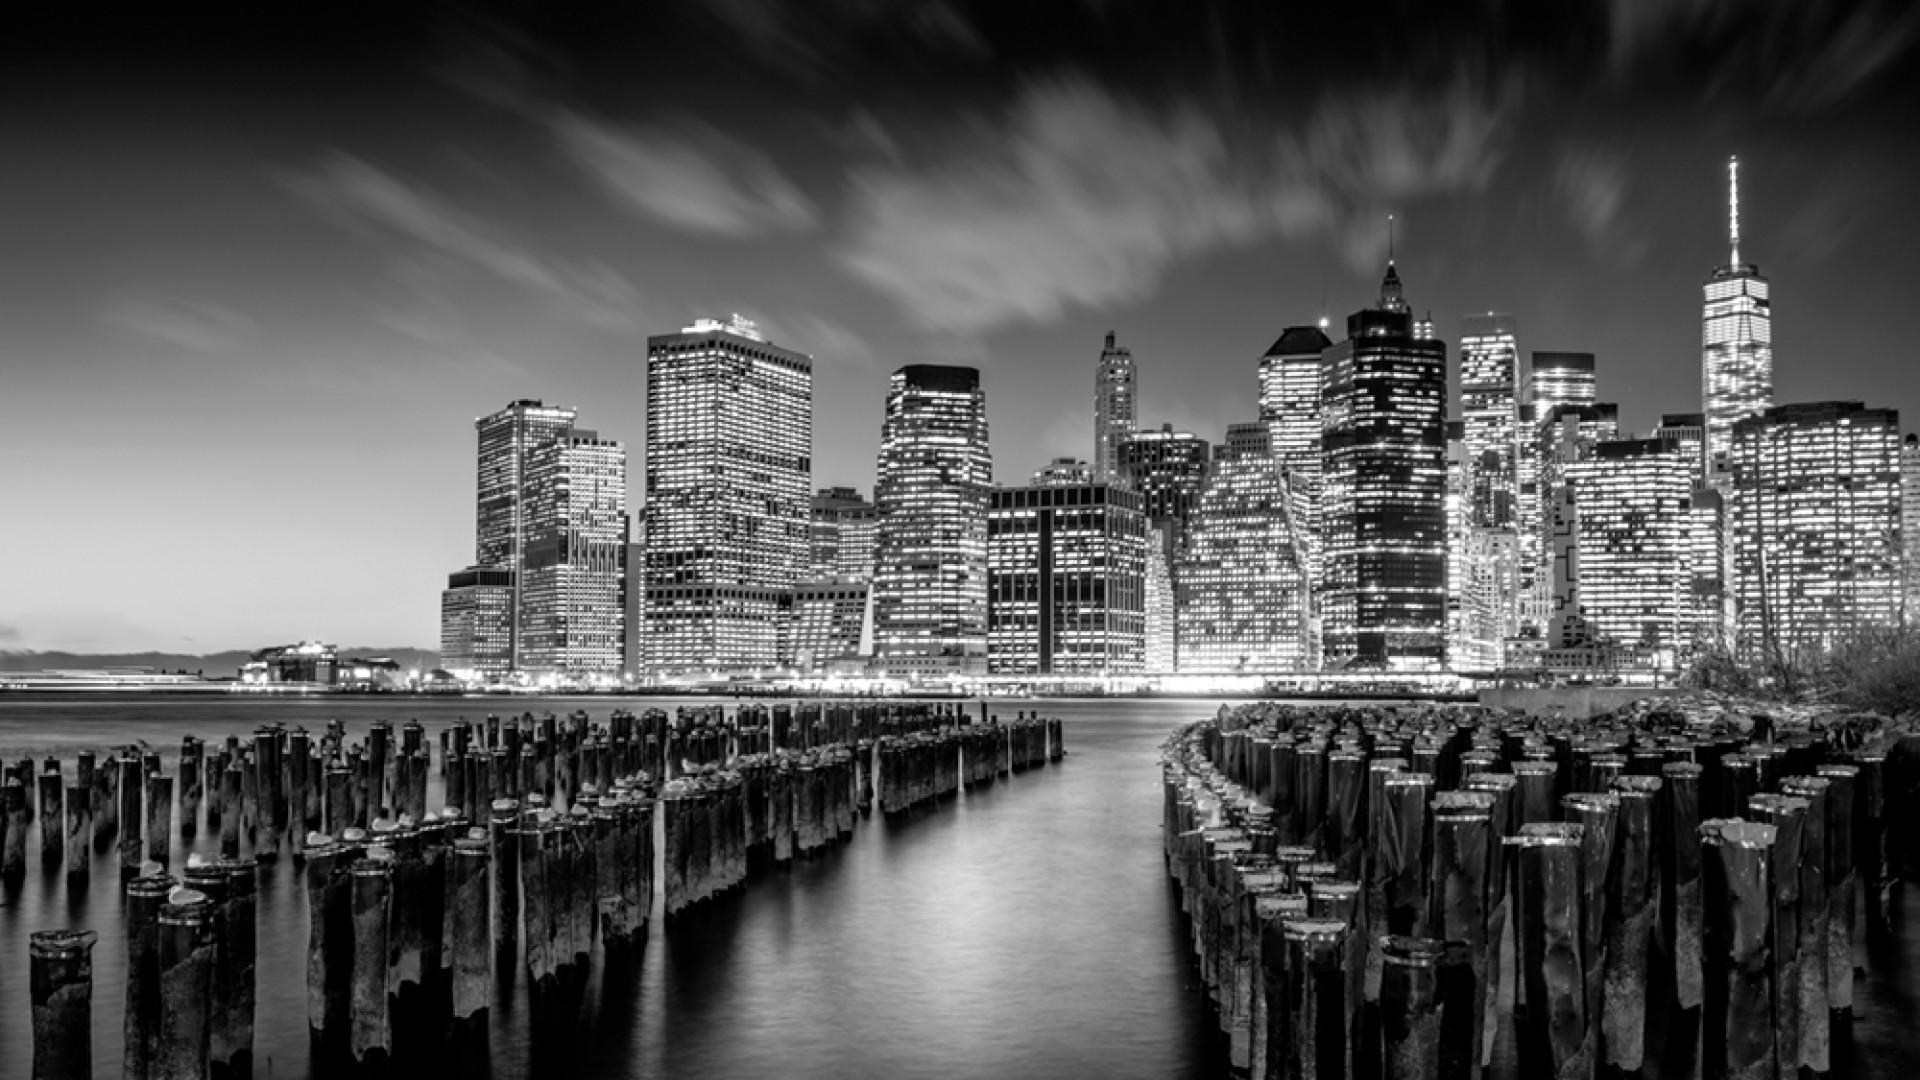 Manhattan skyline in black and white, by Serge Ramelli